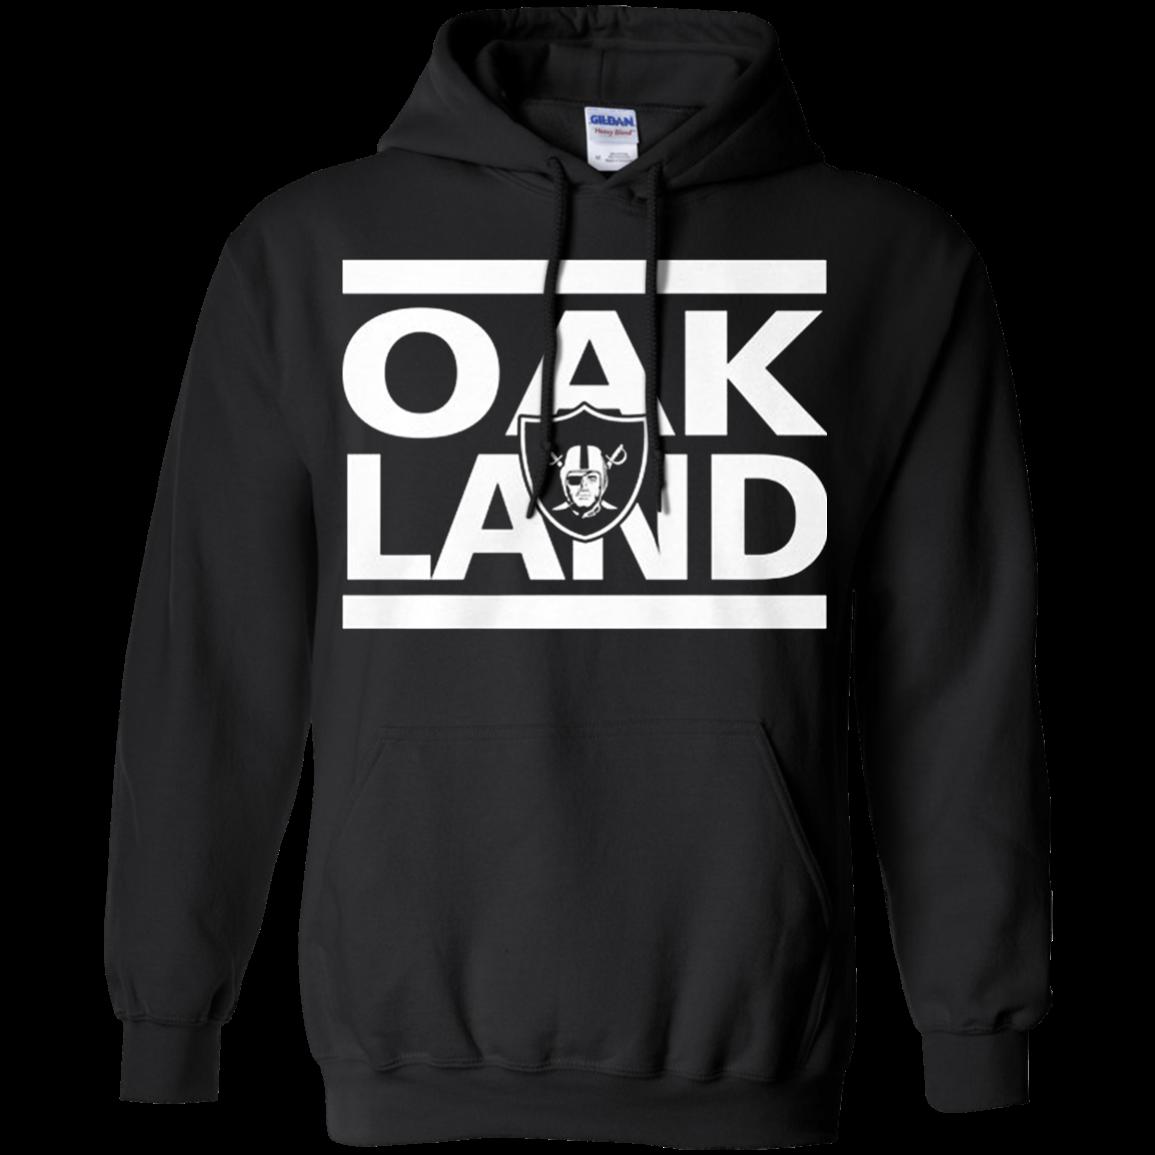 High Quality Run Oakland Raiders Tula Store Shirts